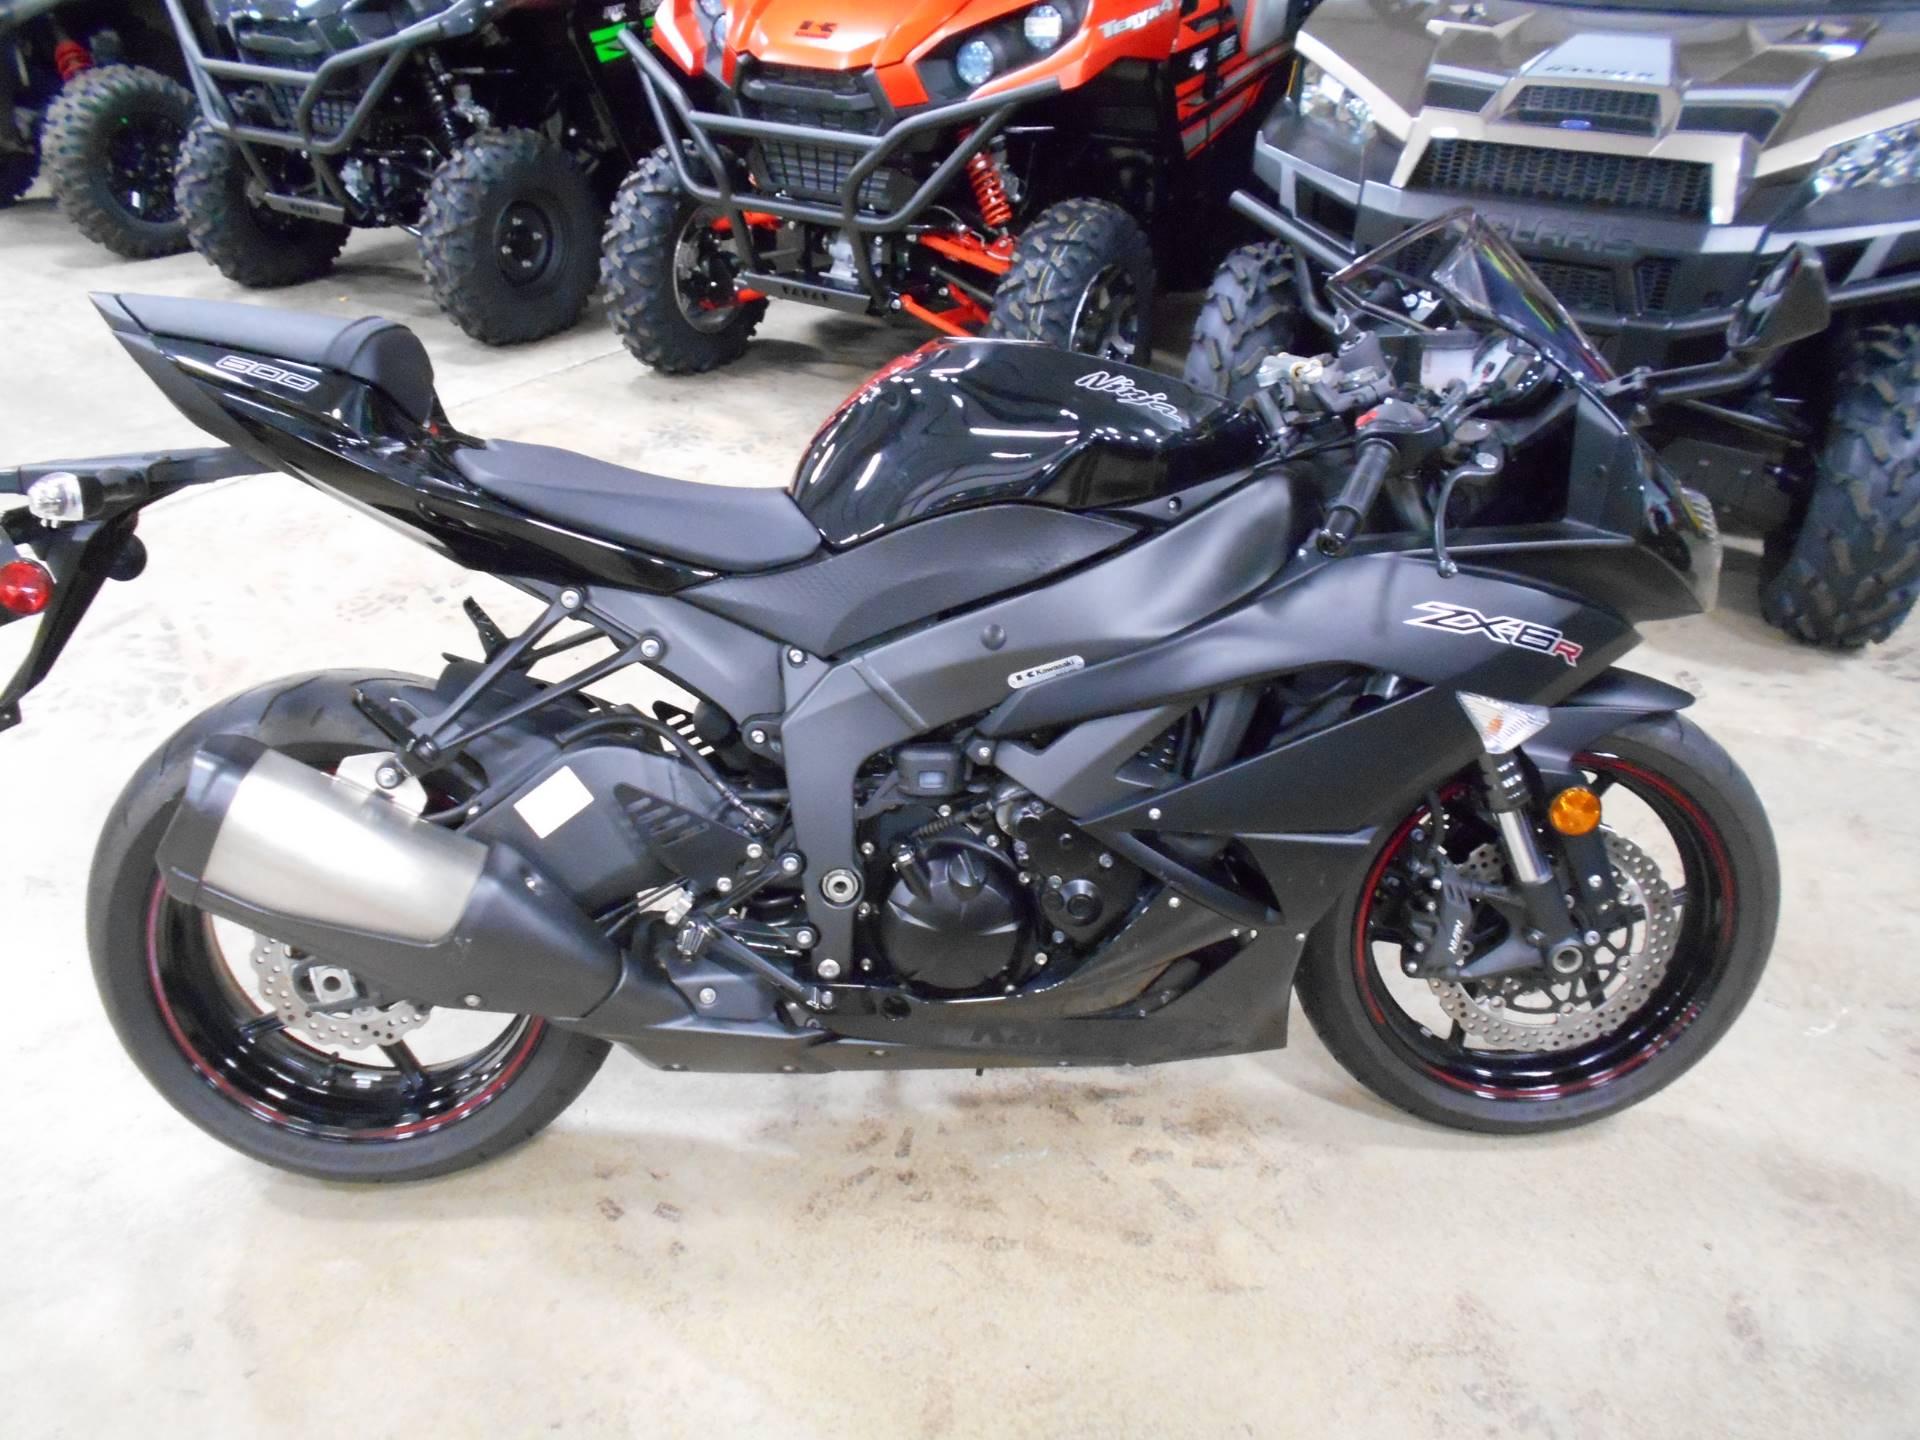 Used 2012 Kawasaki Ninja® ZX™-6R Motorcycles in Belvidere, IL